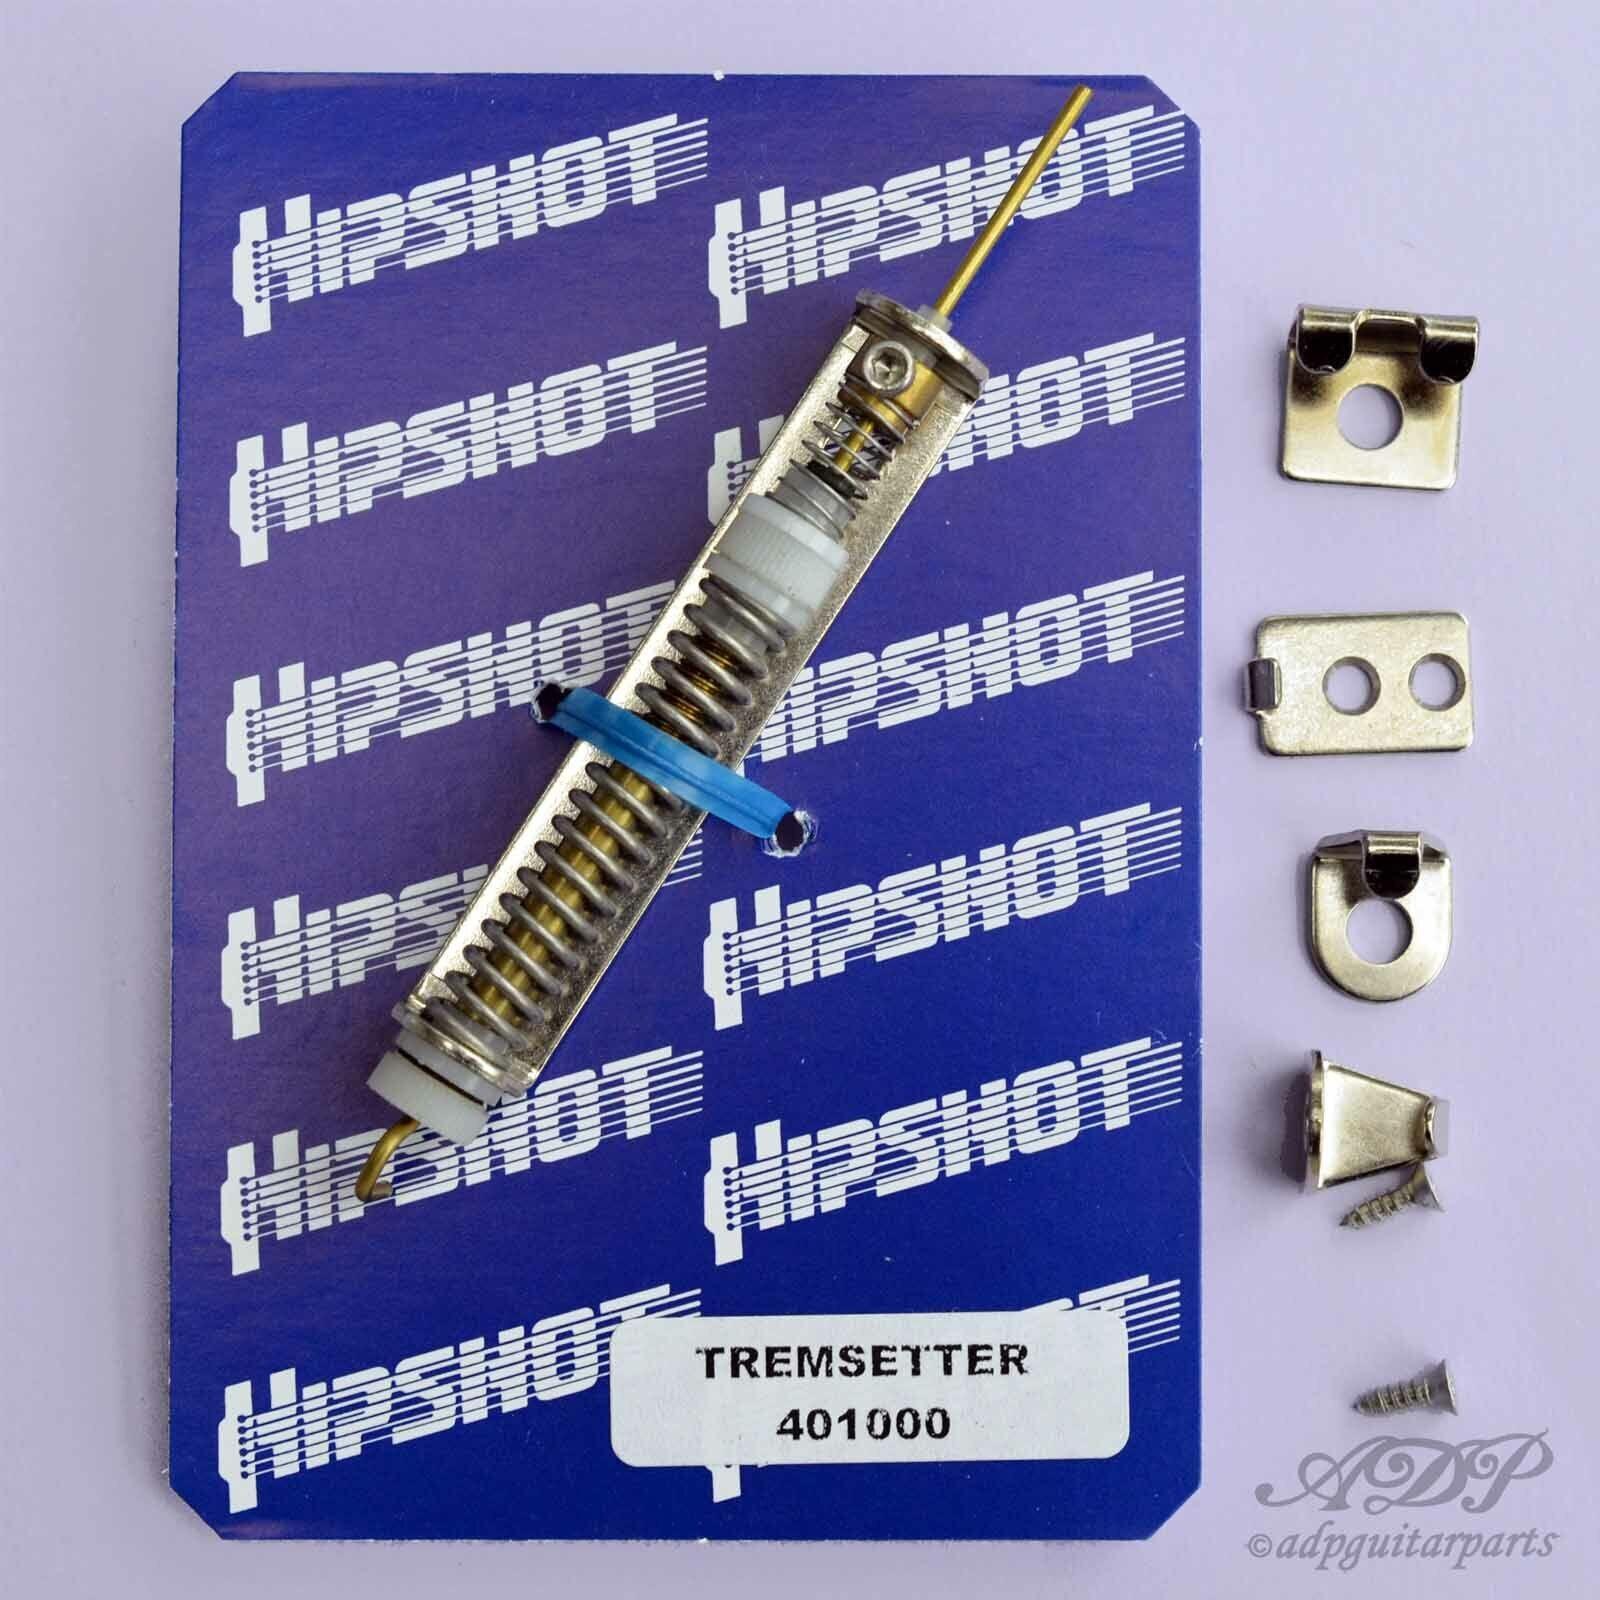 Stabilisateur Vibrato tremSetter Hipshot Tremolo stabilizer Device 401000